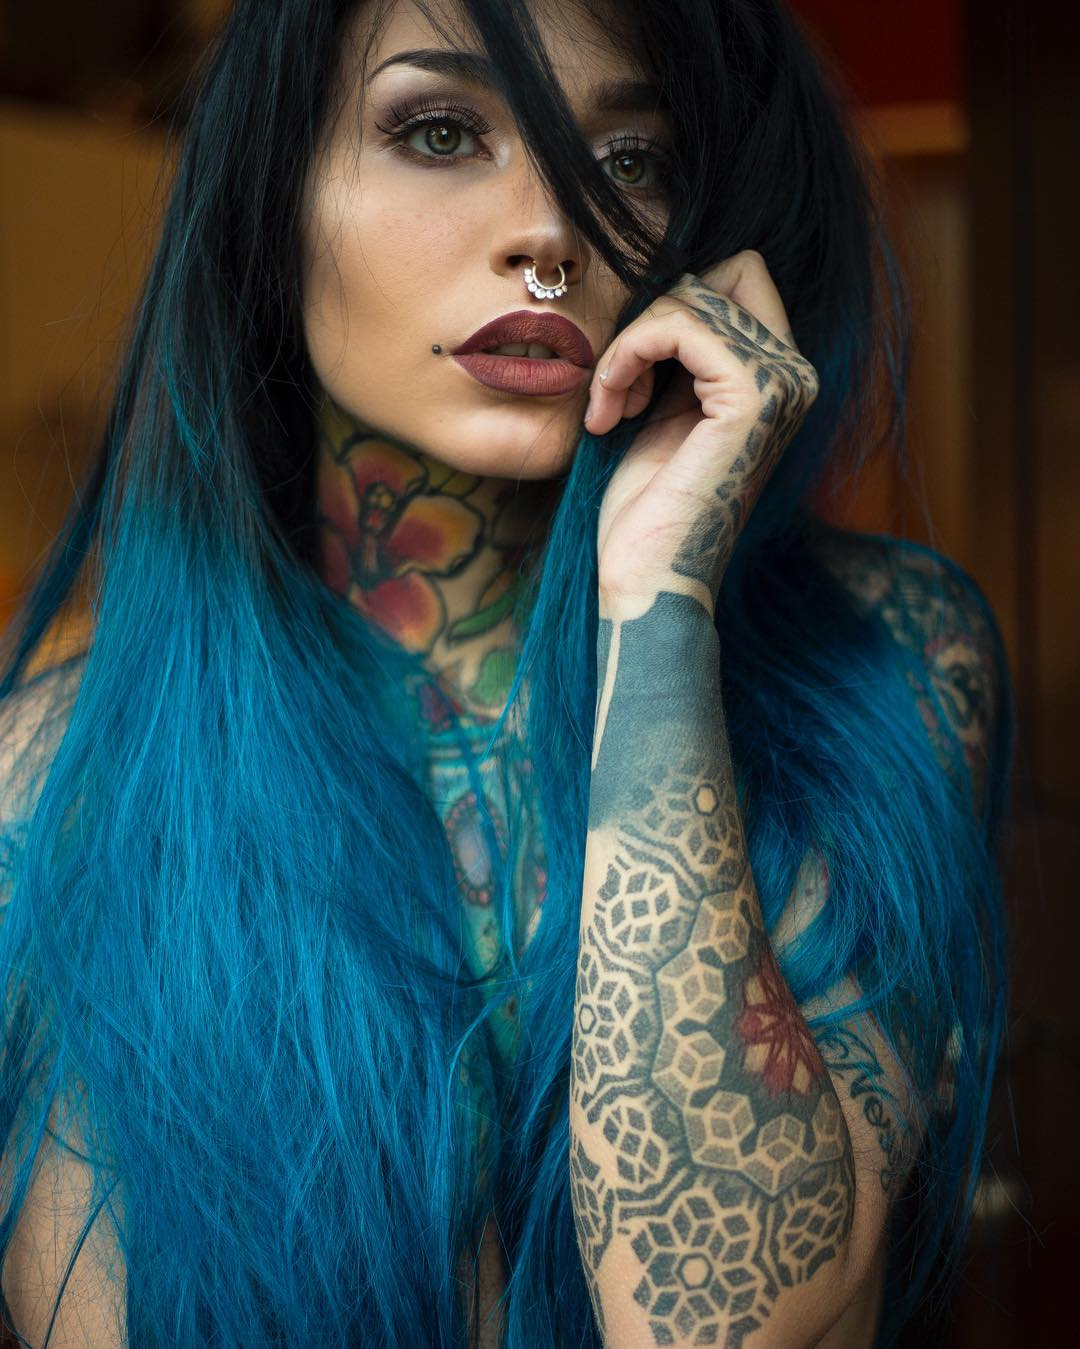 tattooed girl felisja piana